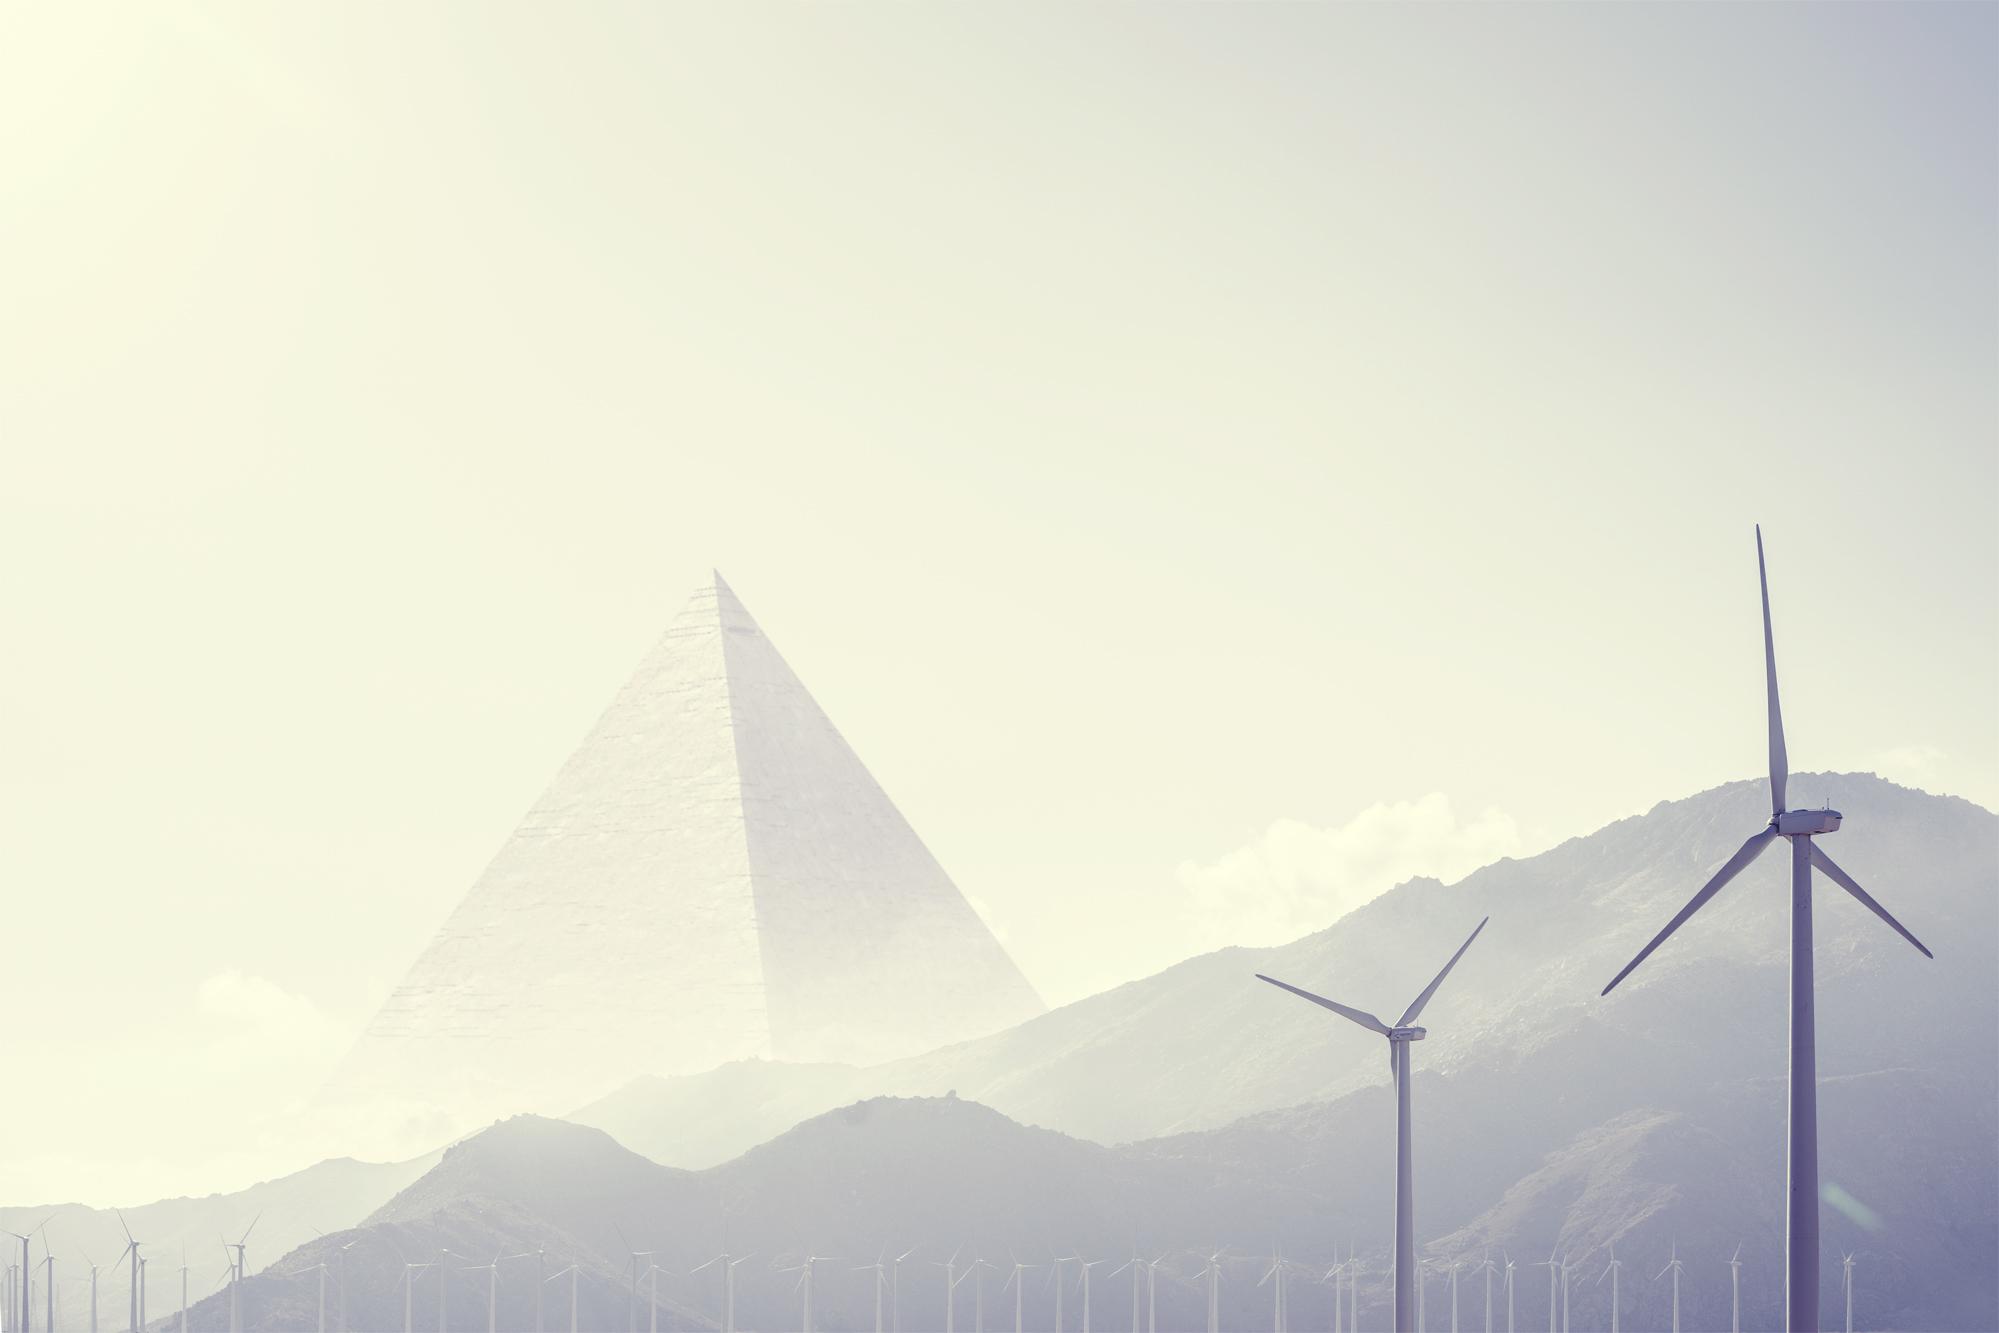 Chris CLor wind turbines